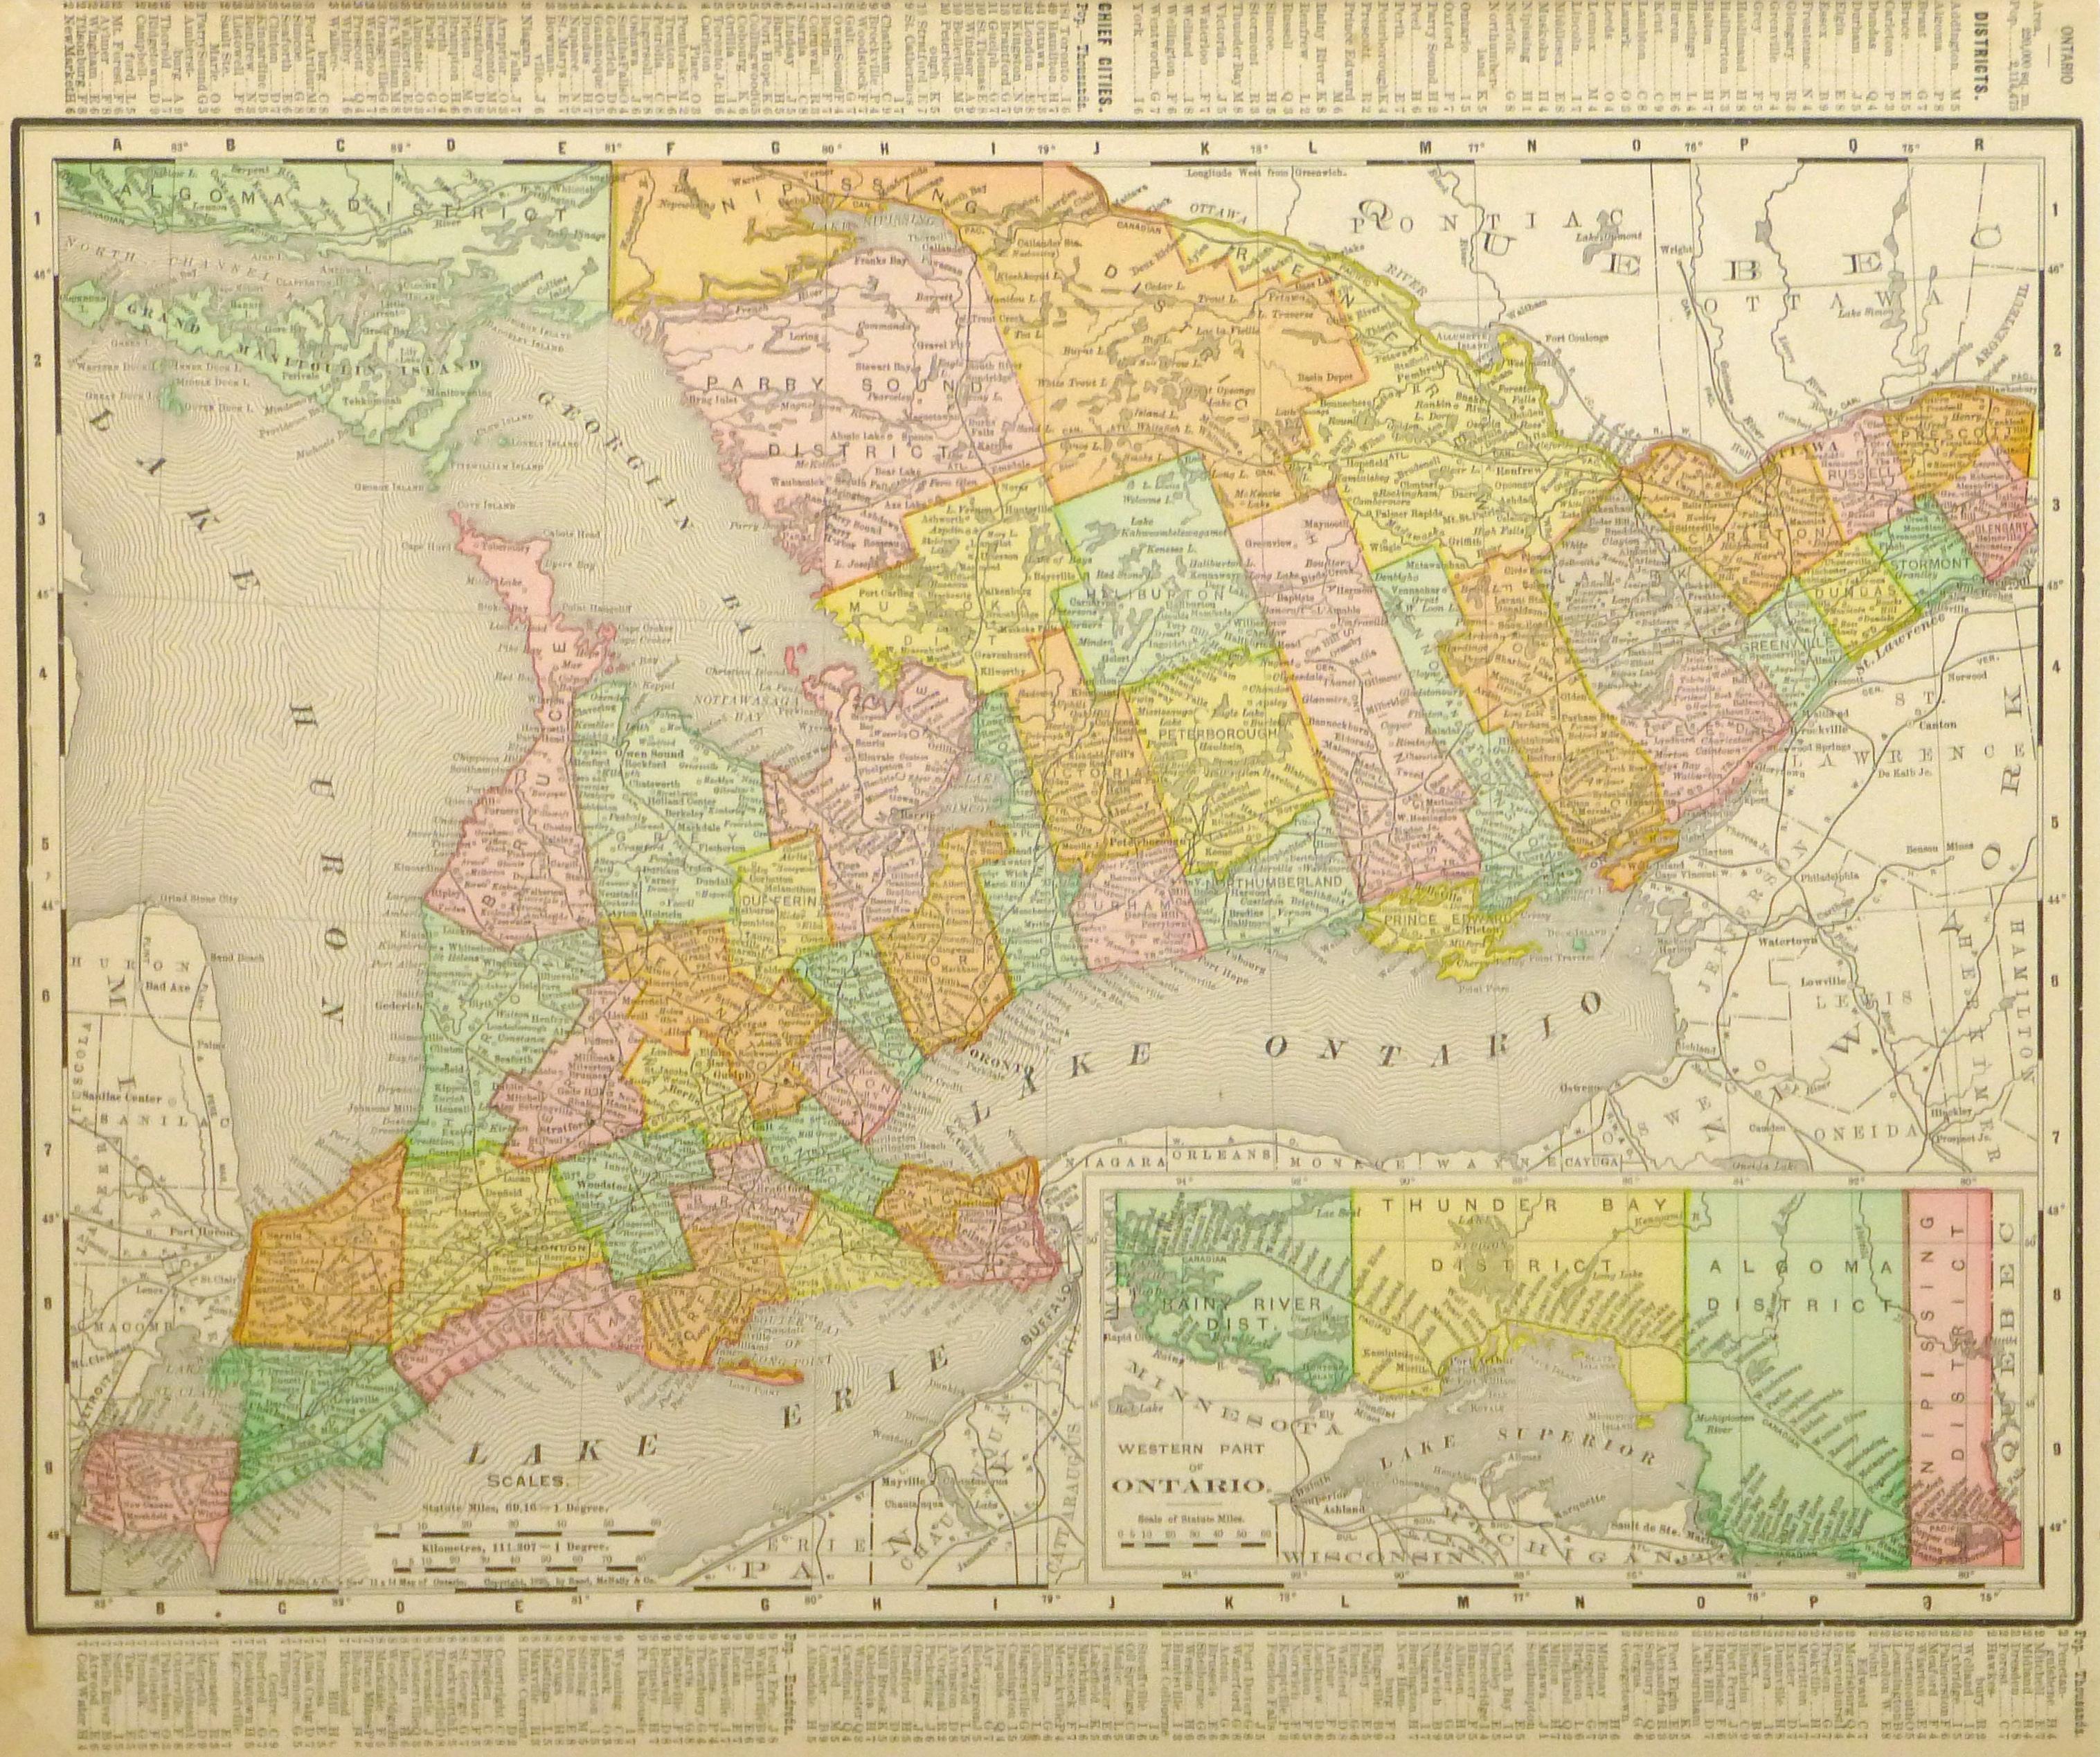 Ontario, Canada Map, 1895-main-8556K